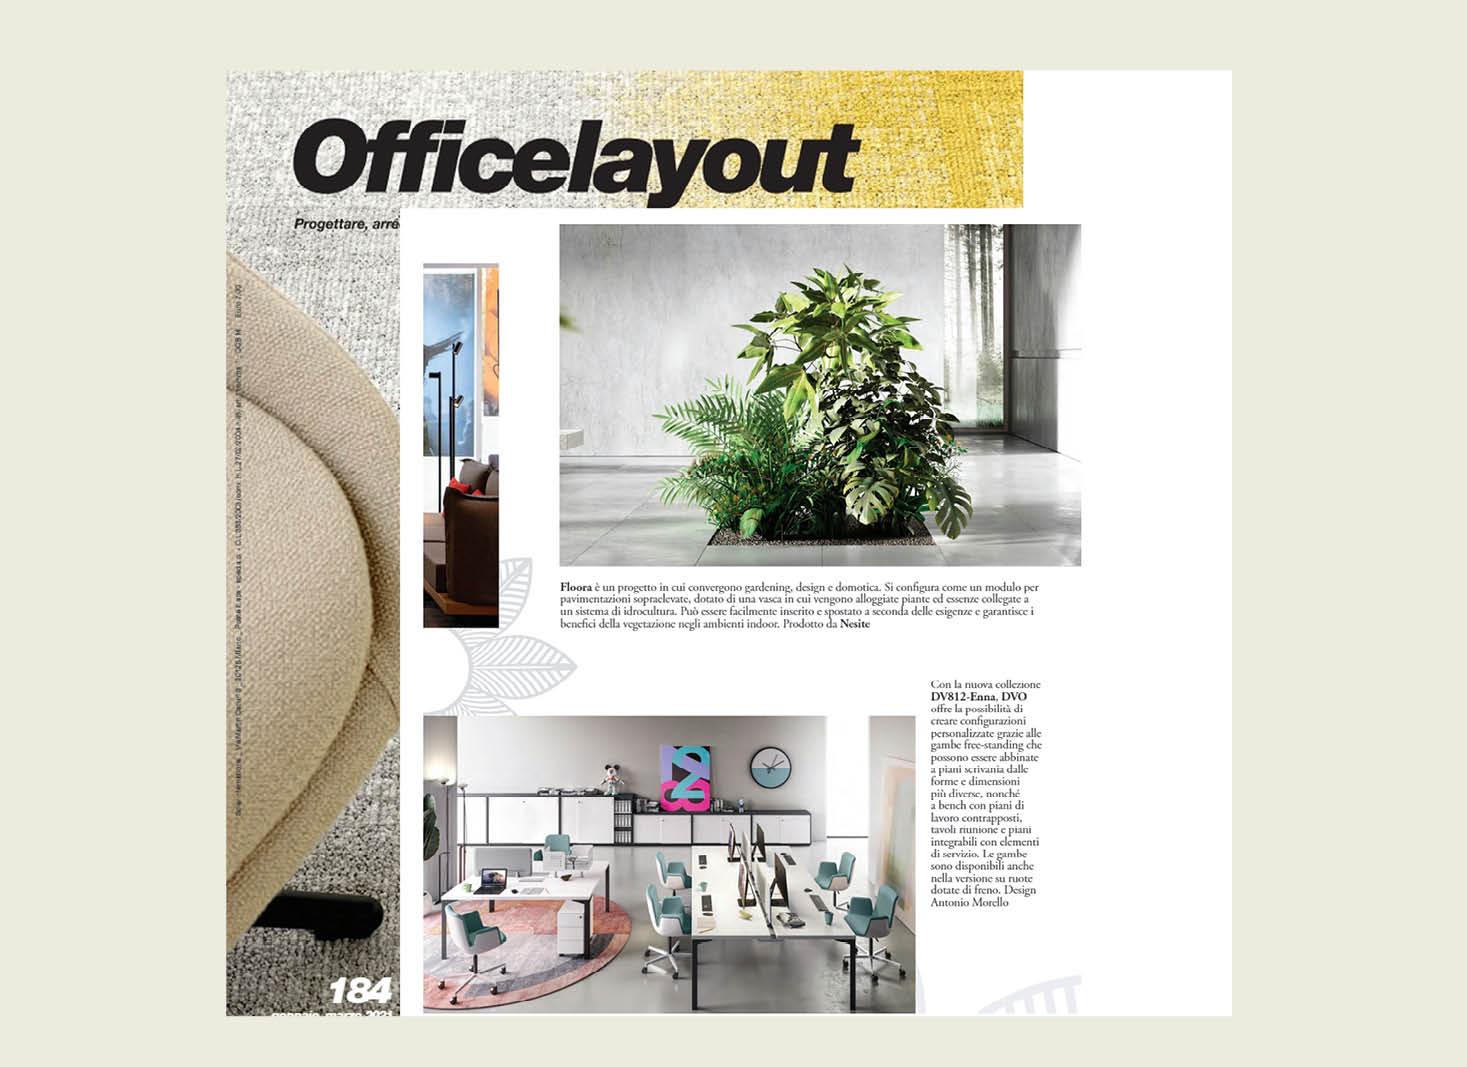 Floora - Officelayout no.184